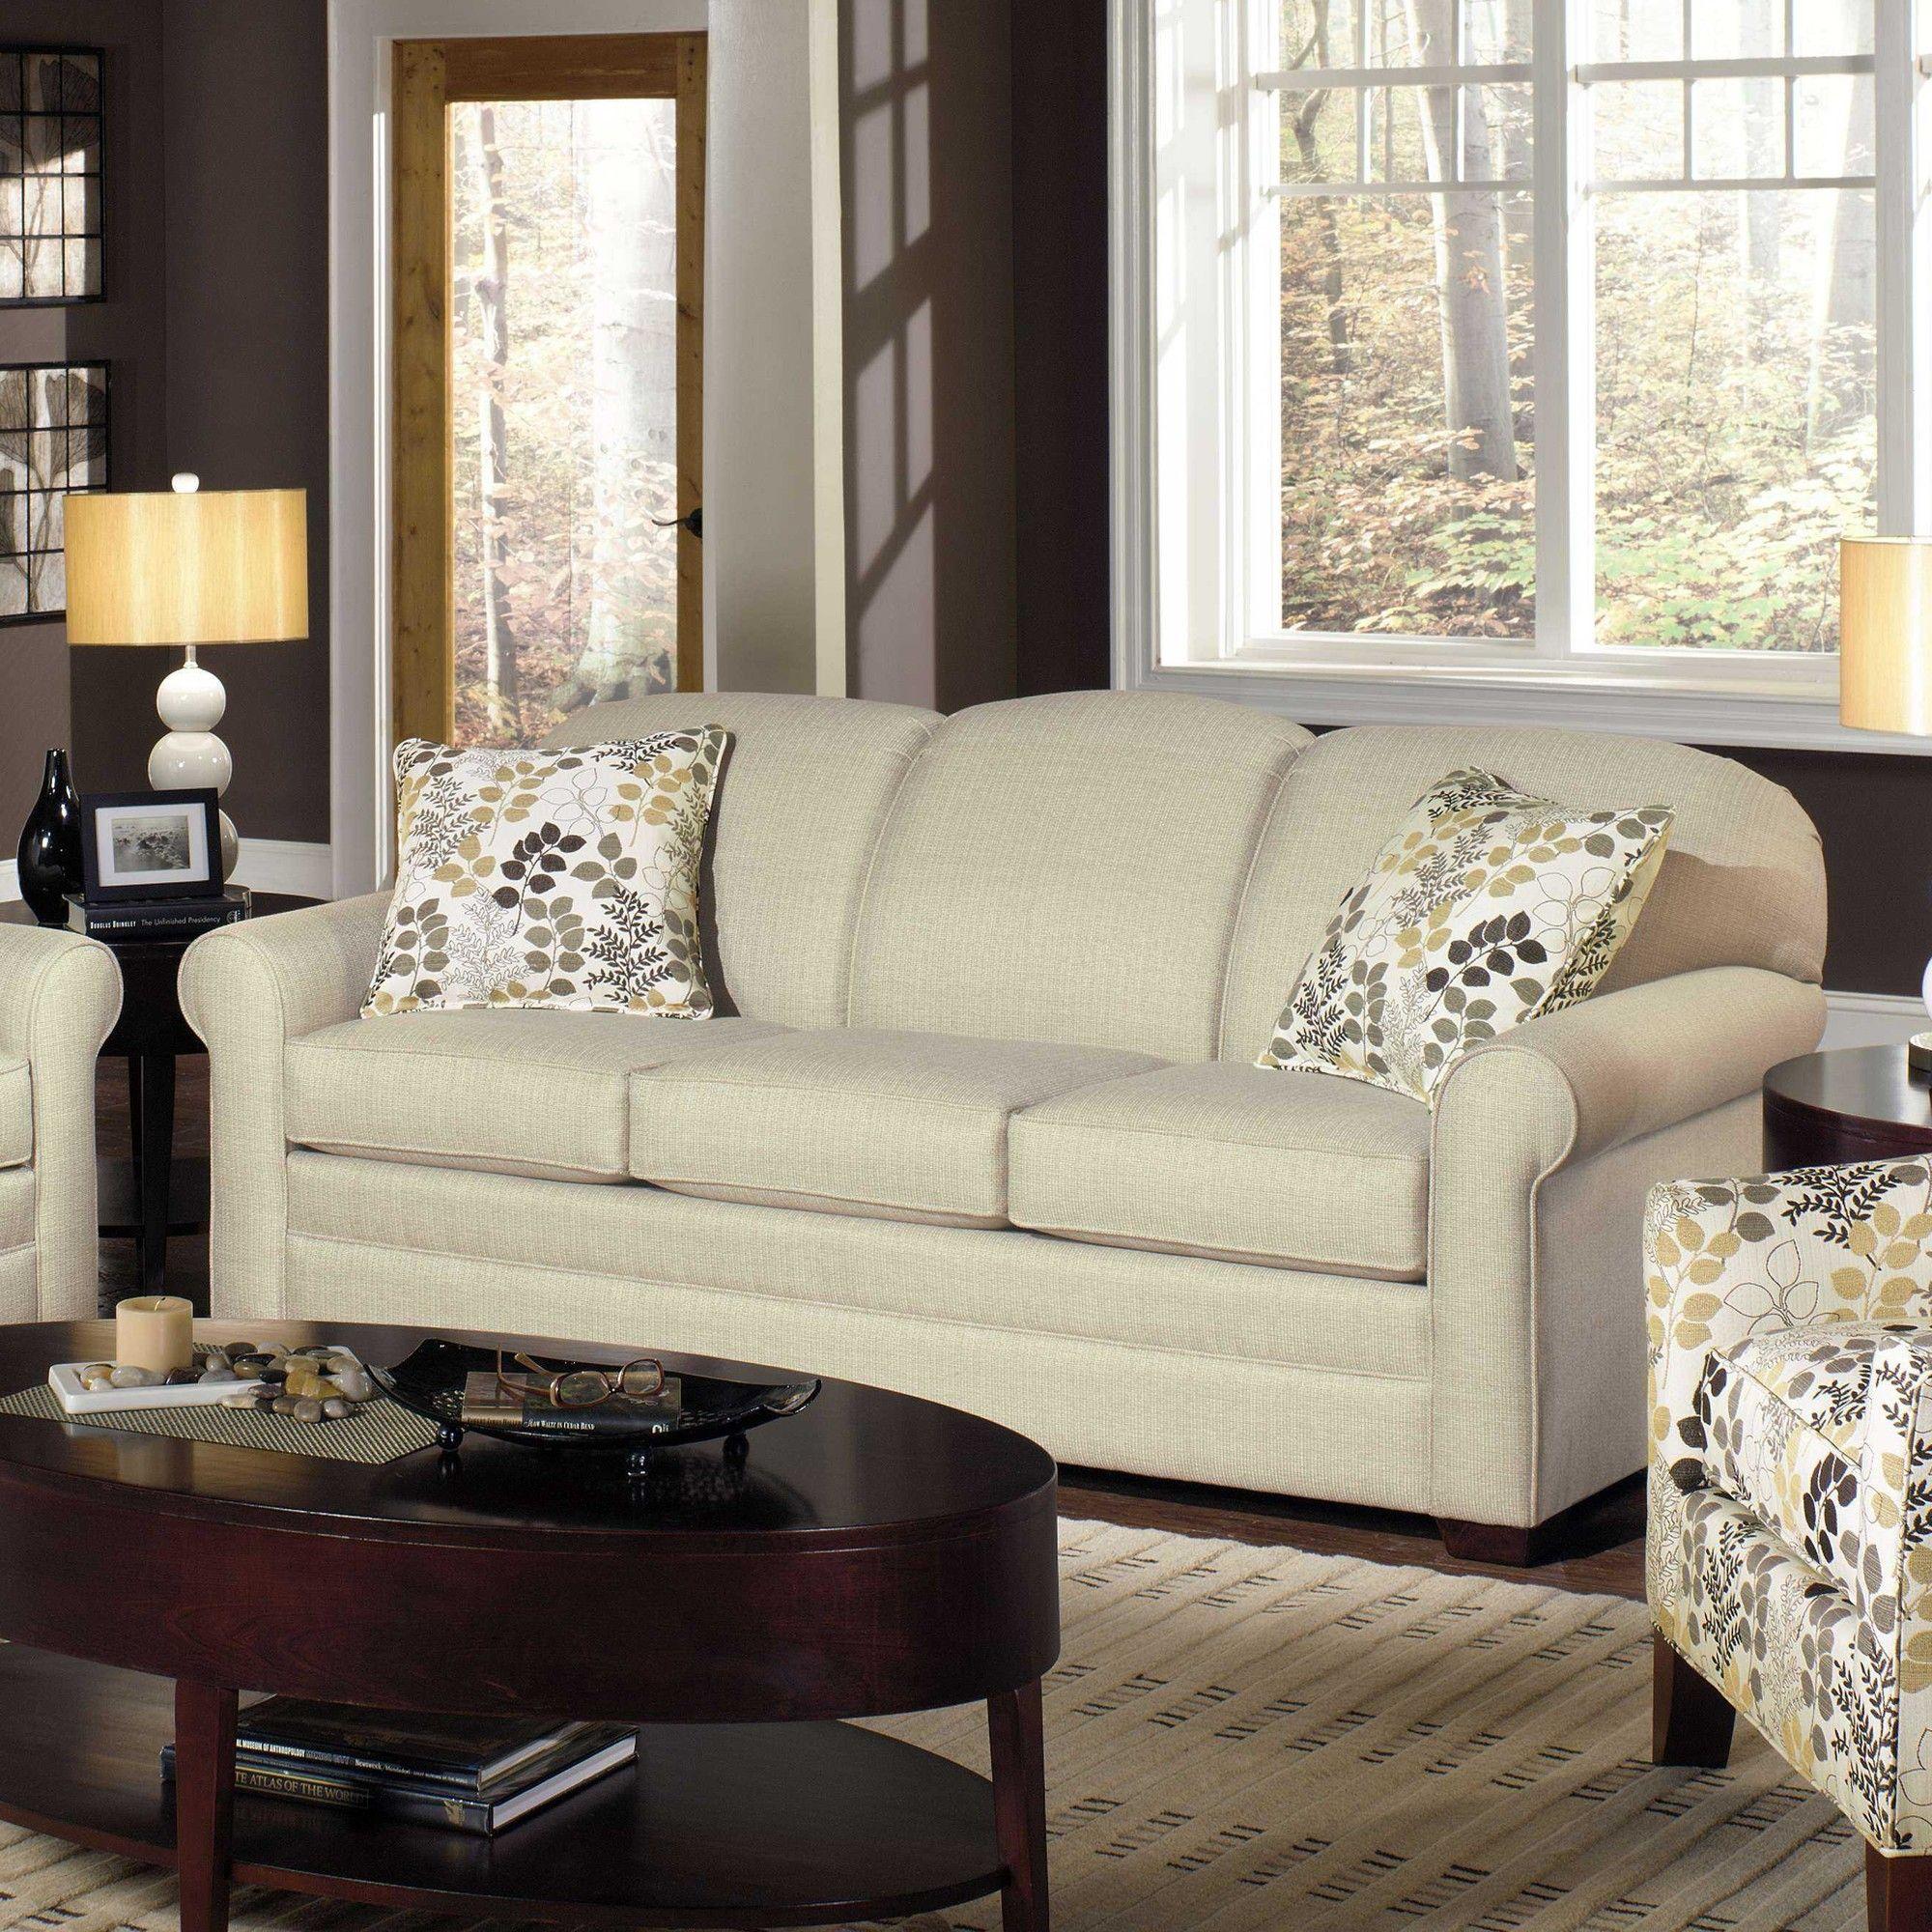 Shangrila Queen Sleeper Sofa  Furniture, Sofa, Living room sofa